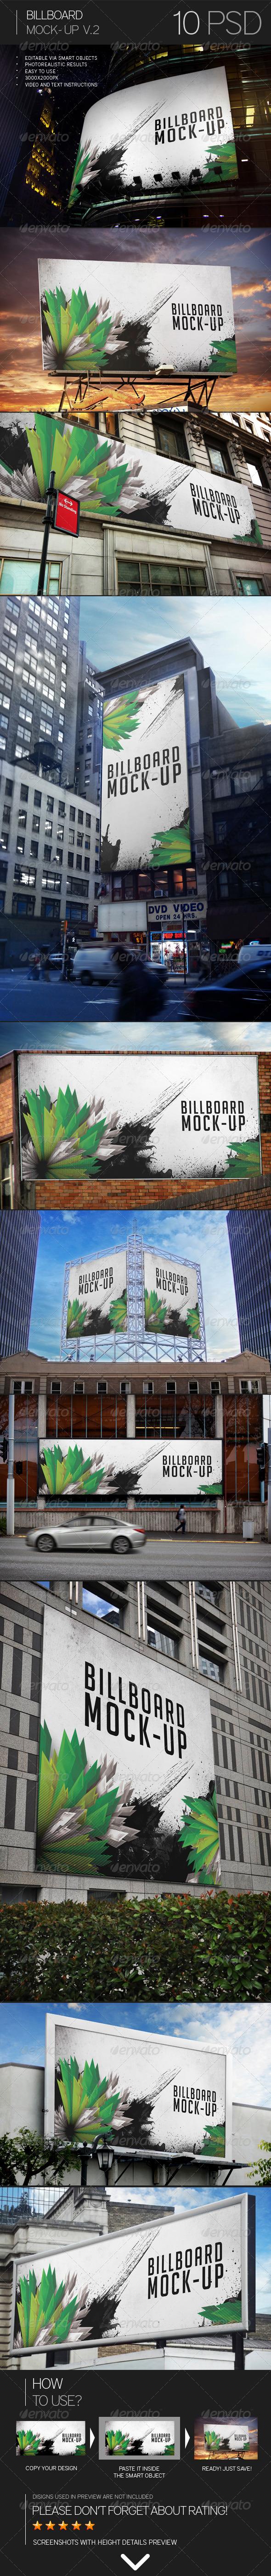 GraphicRiver Billboard Mock-Up Vol.2 8020154